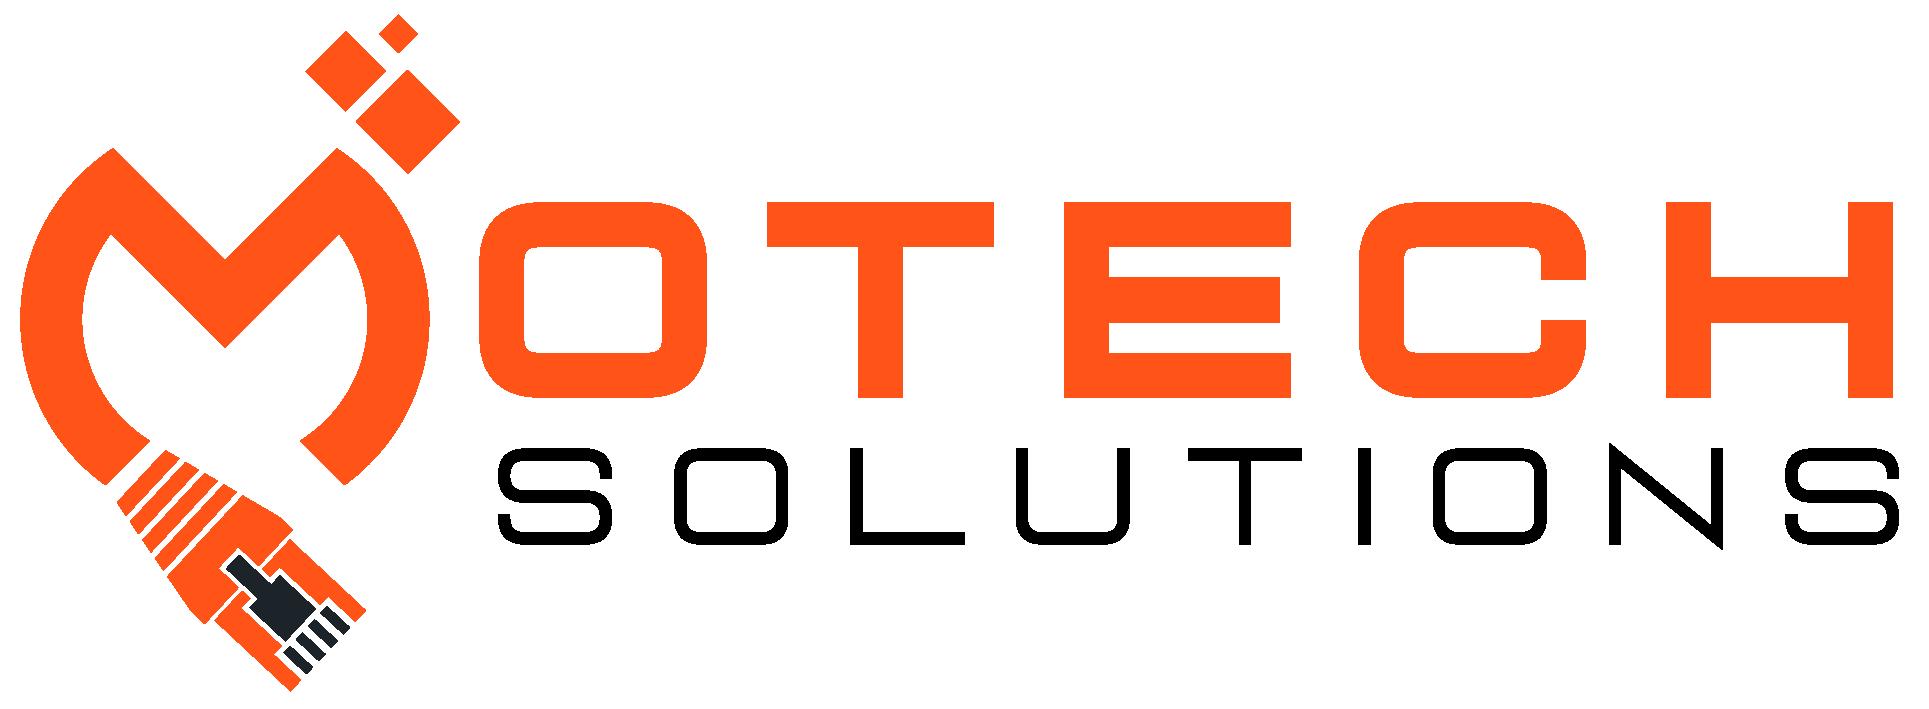 industrie-sidebar-logo